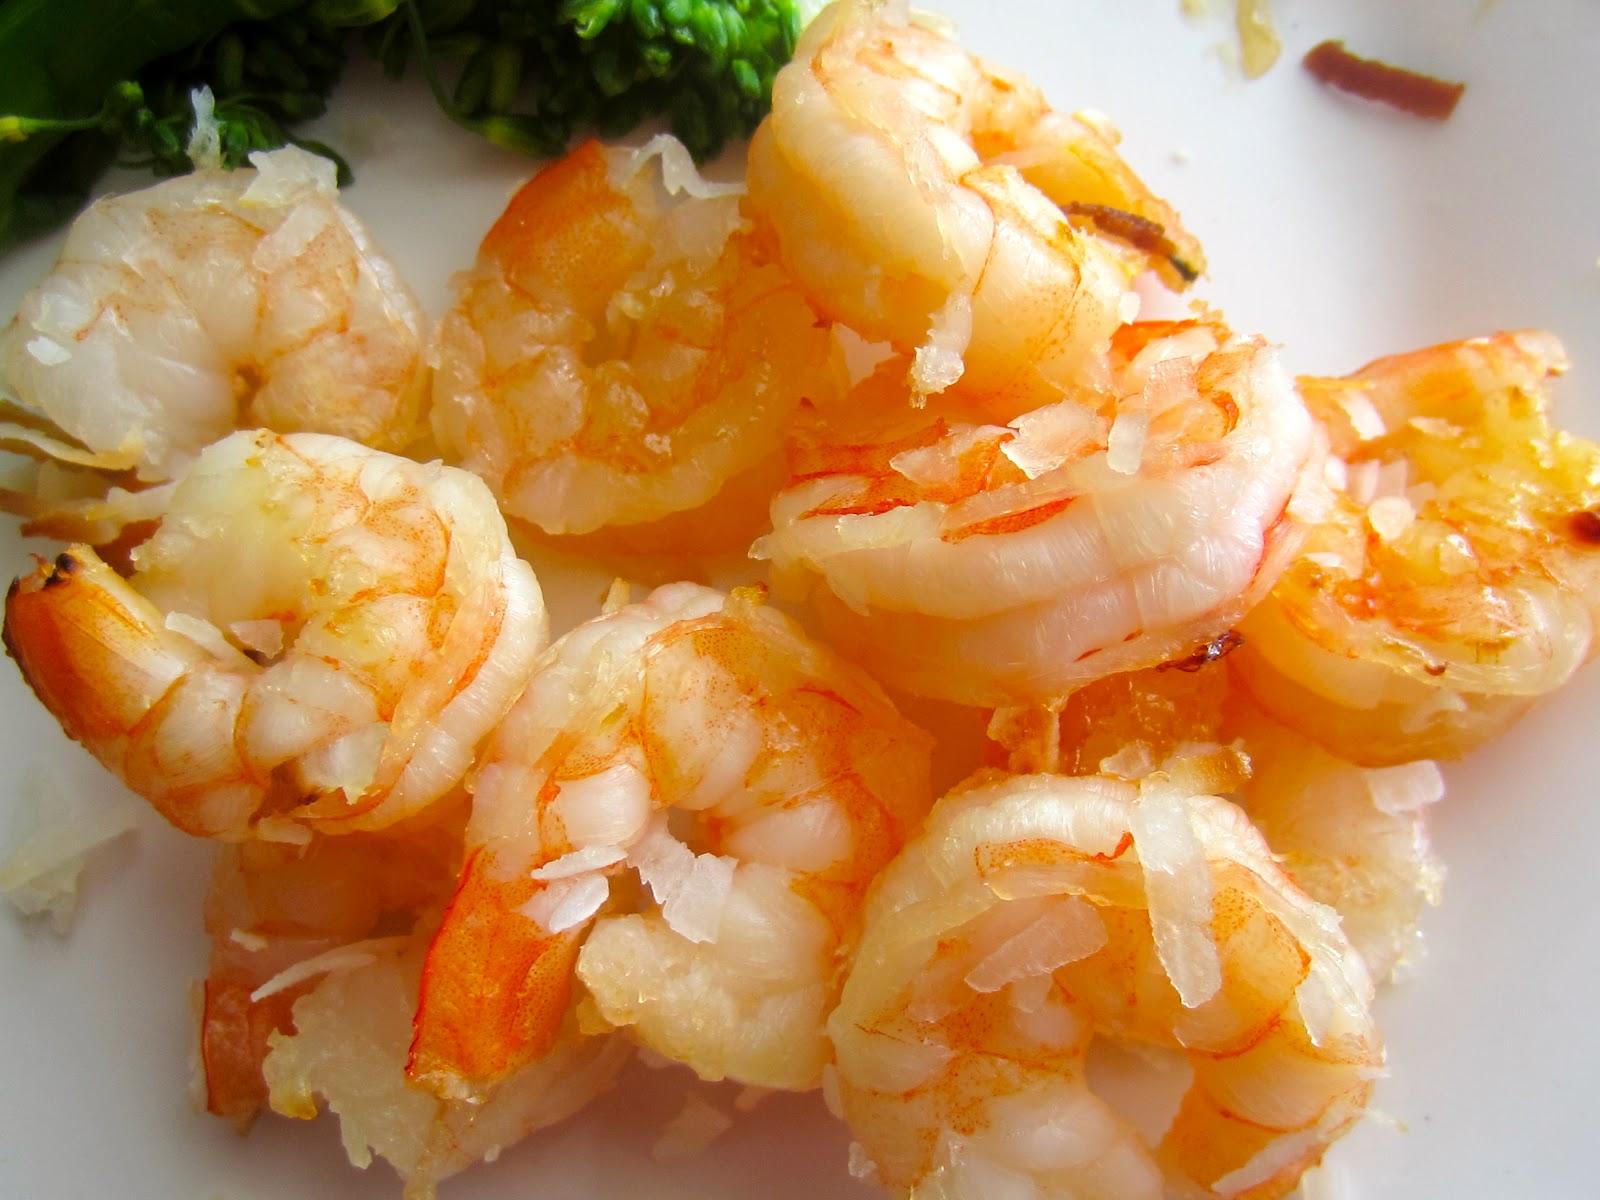 Little Bungalow Eats: Skinny Coconut Shrimp Skewers